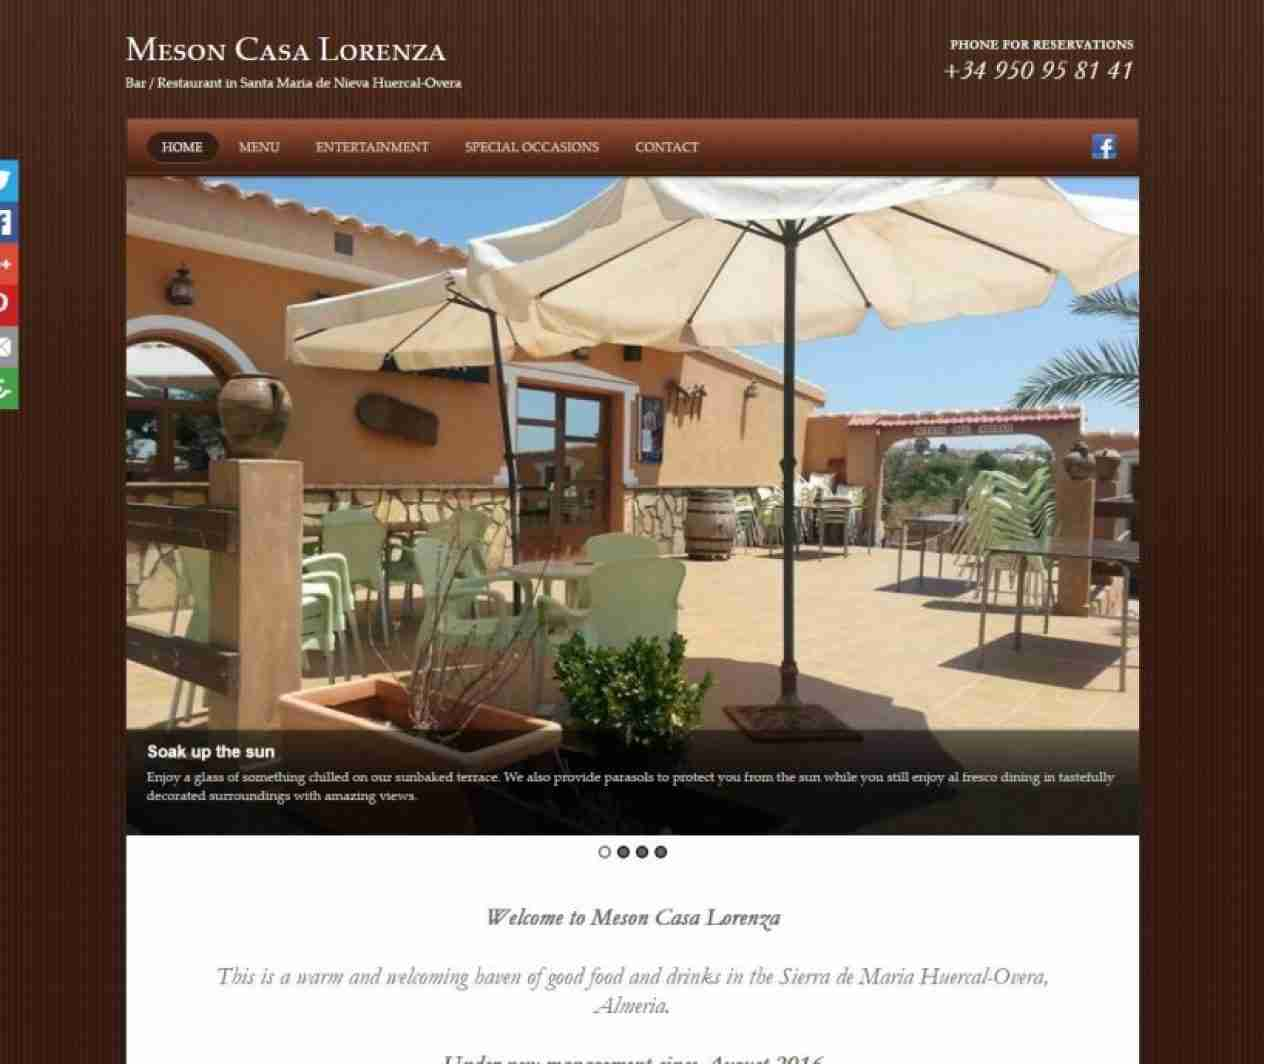 Meson Casa Lorenza